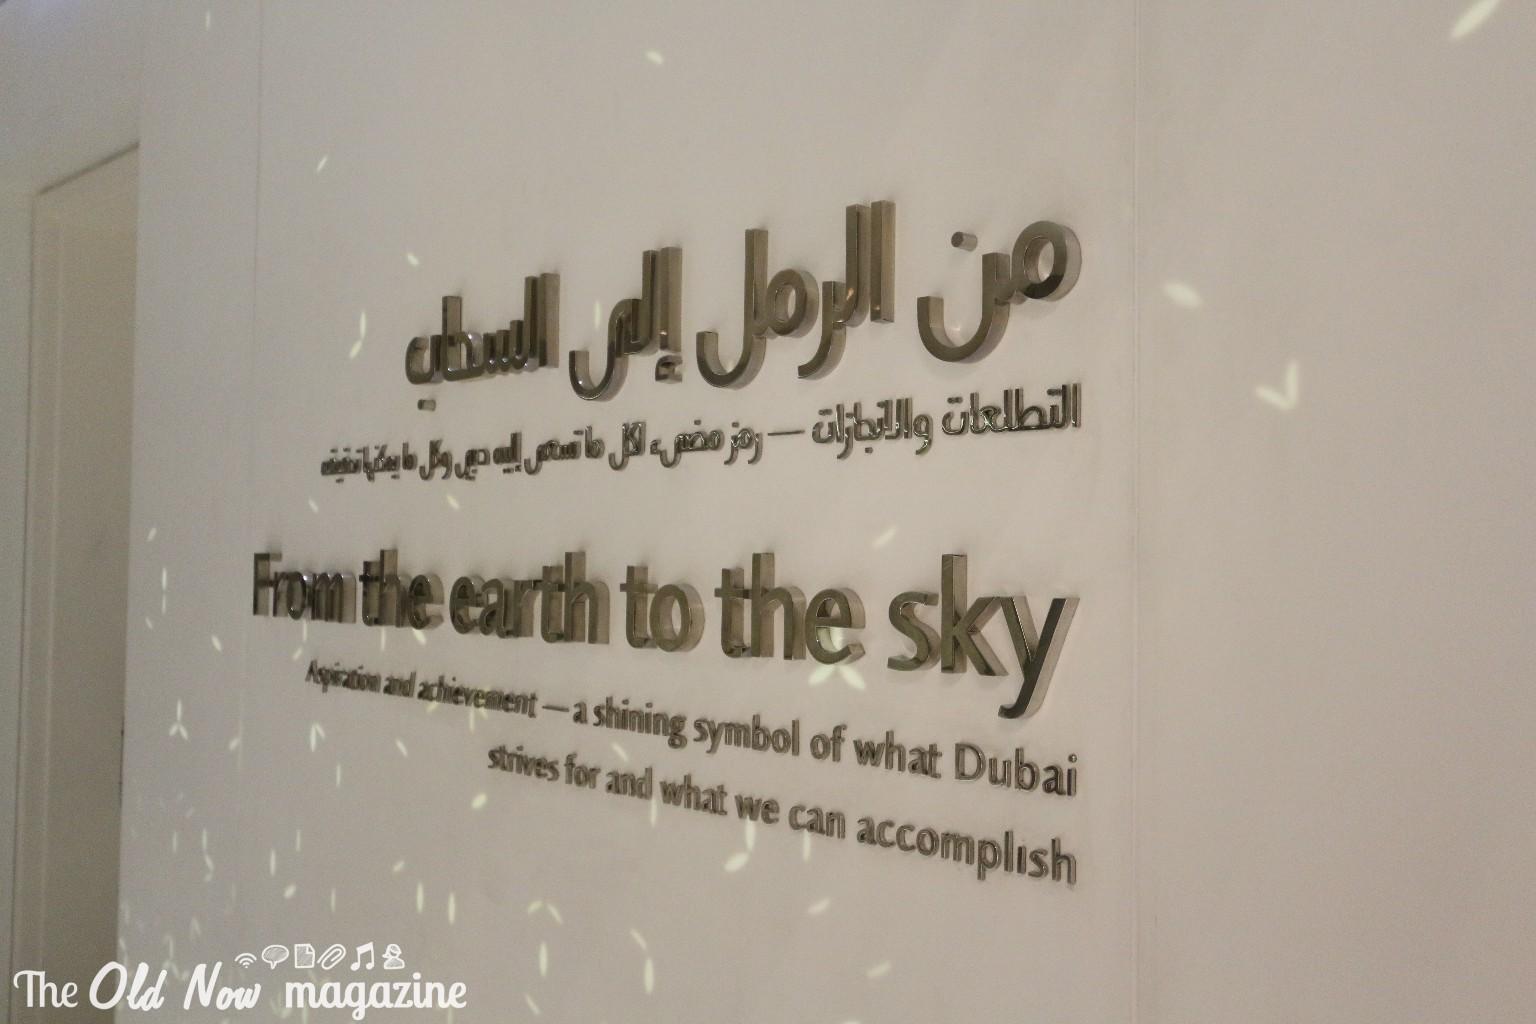 Dubai DAY3 THEOLDNOW (92)